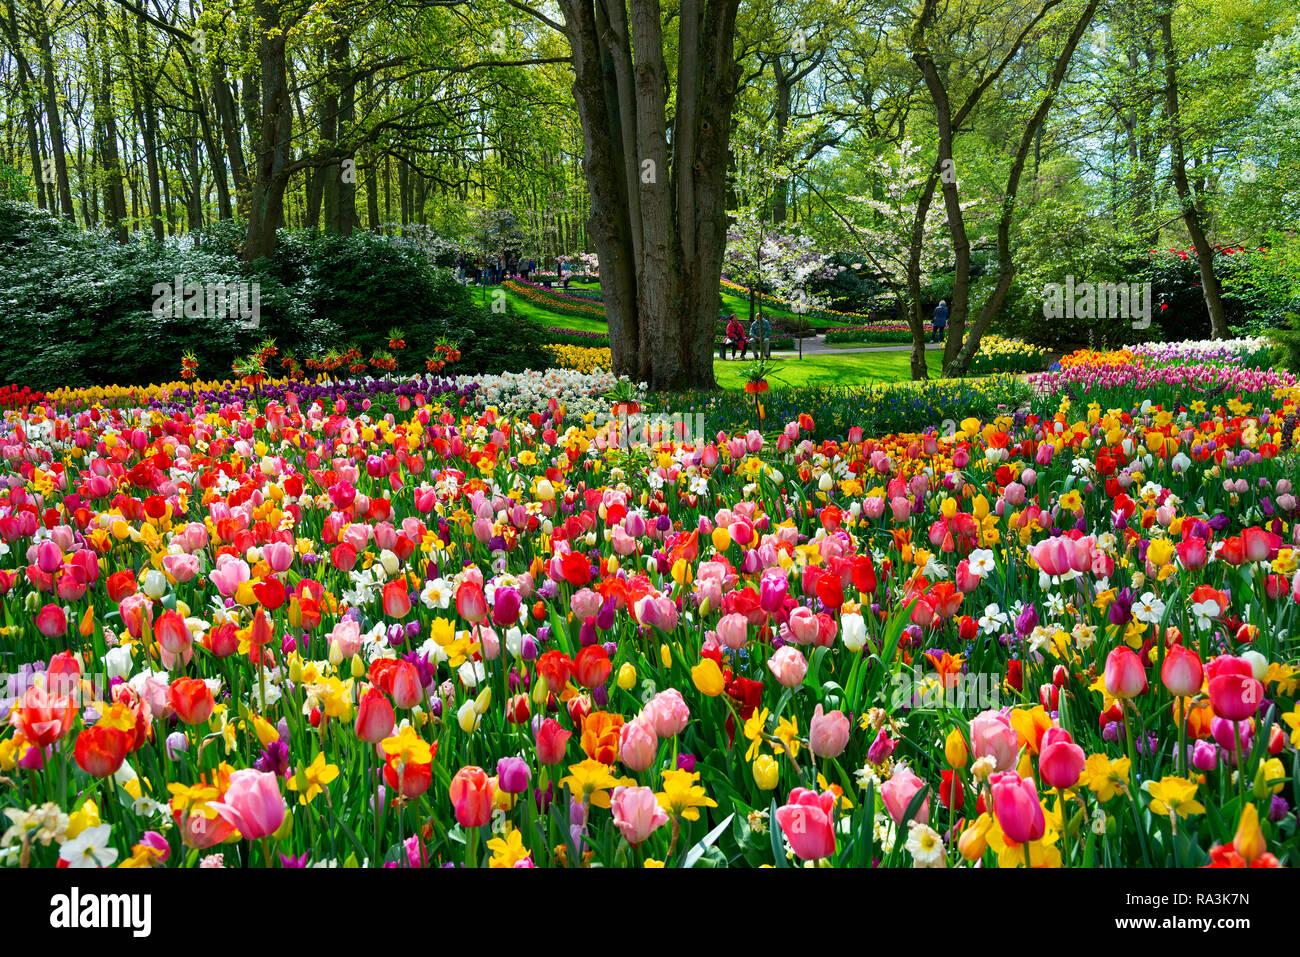 Spectacular display of spring flowering bulbs at the world's largest bulb flower garden Keukenhof Gardens in April 2018, Lisse,Holland,The Netherlands - Stock Image